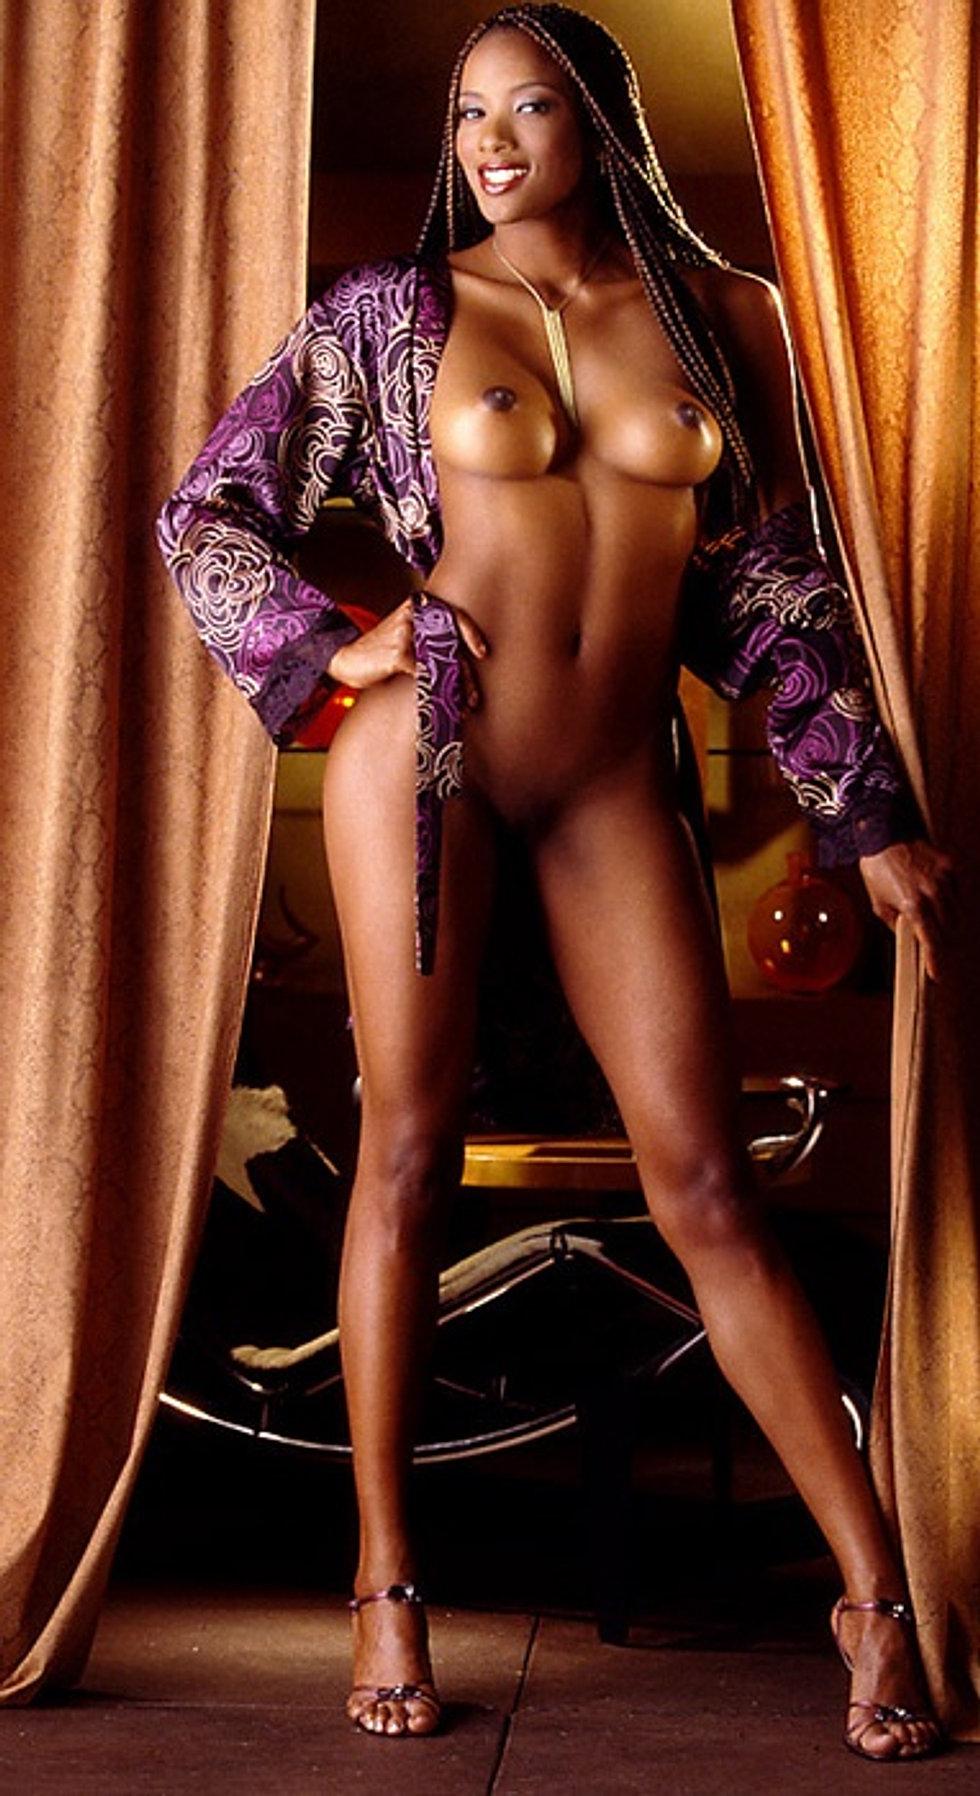 эро фото стройных мулаток